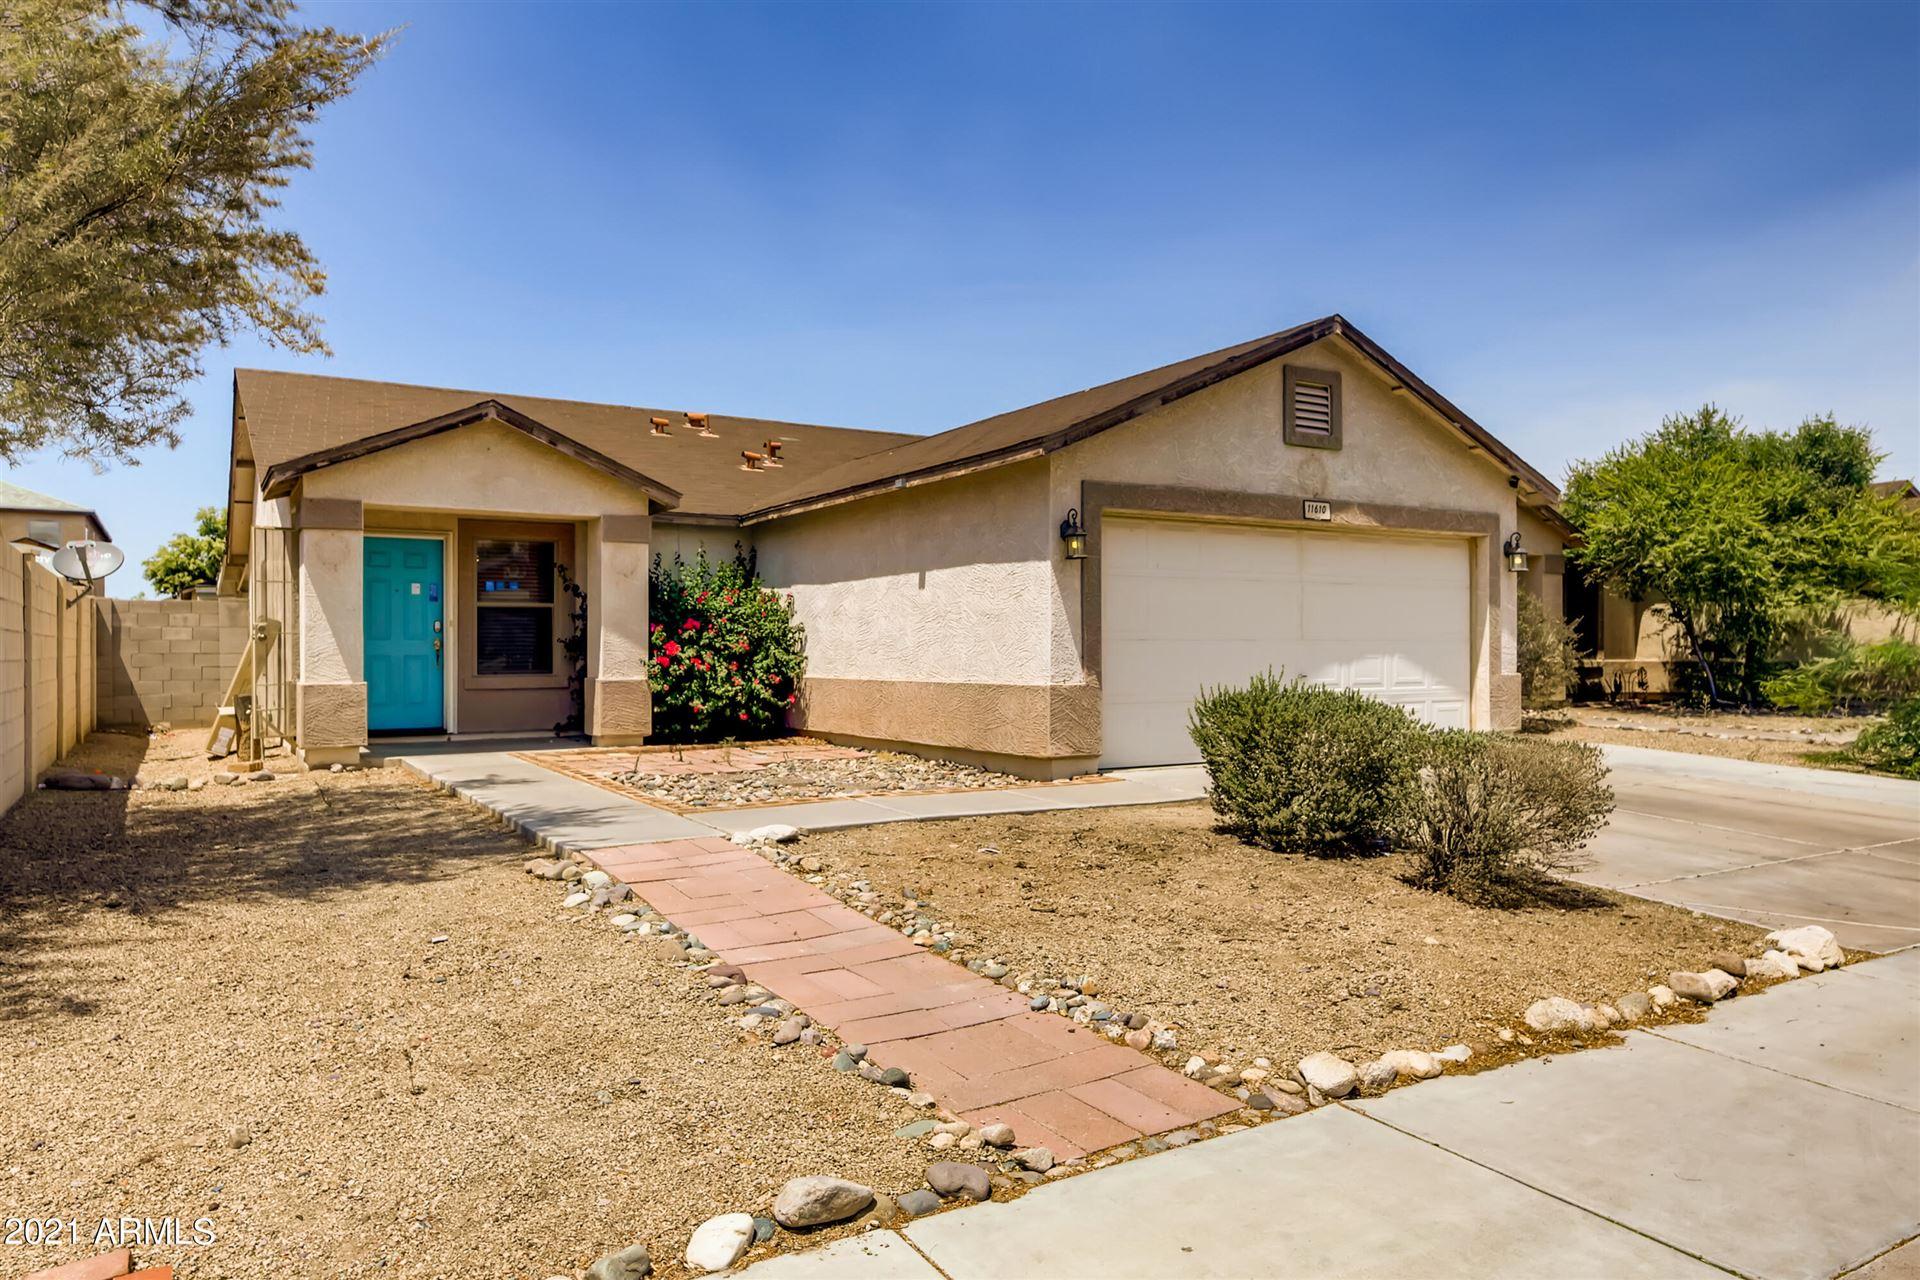 11610 W WETHERSFIELD Road, El Mirage, AZ 85335 - MLS#: 6249726